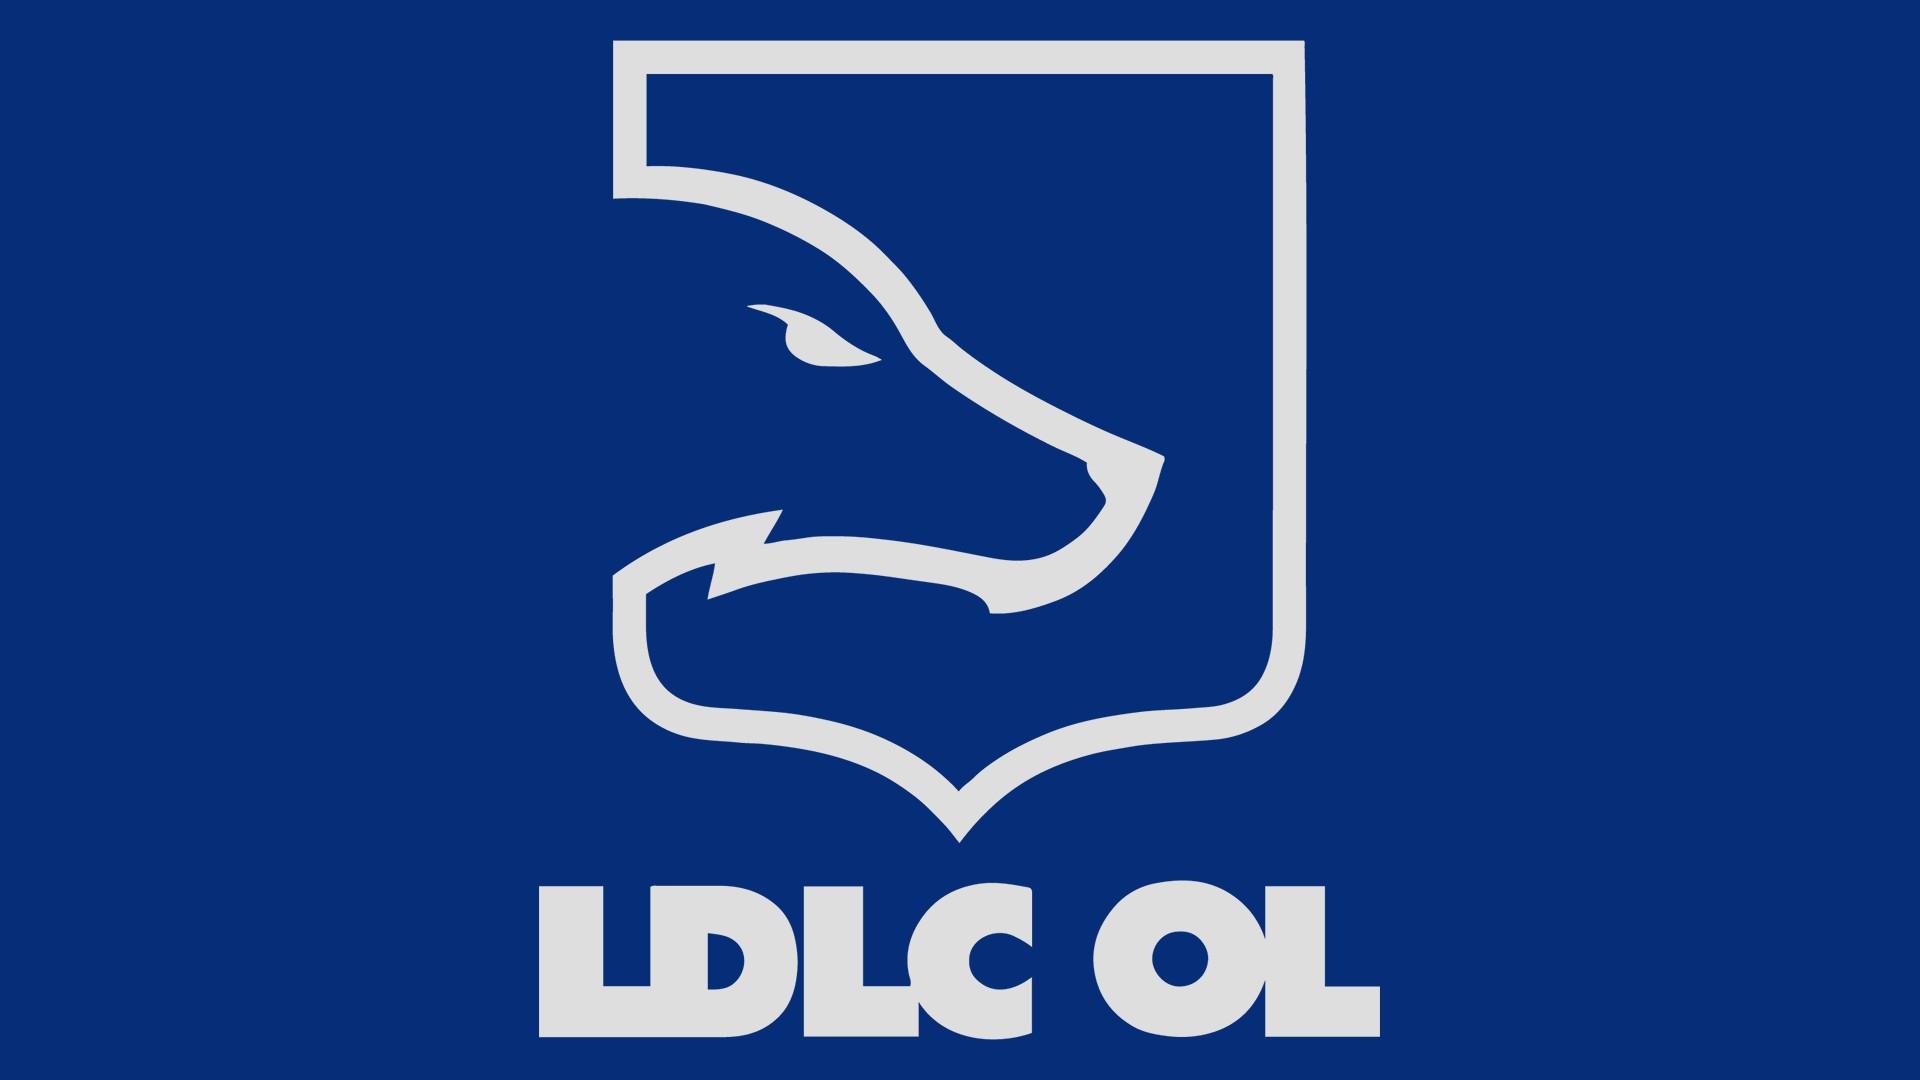 eSport – LDLC OL